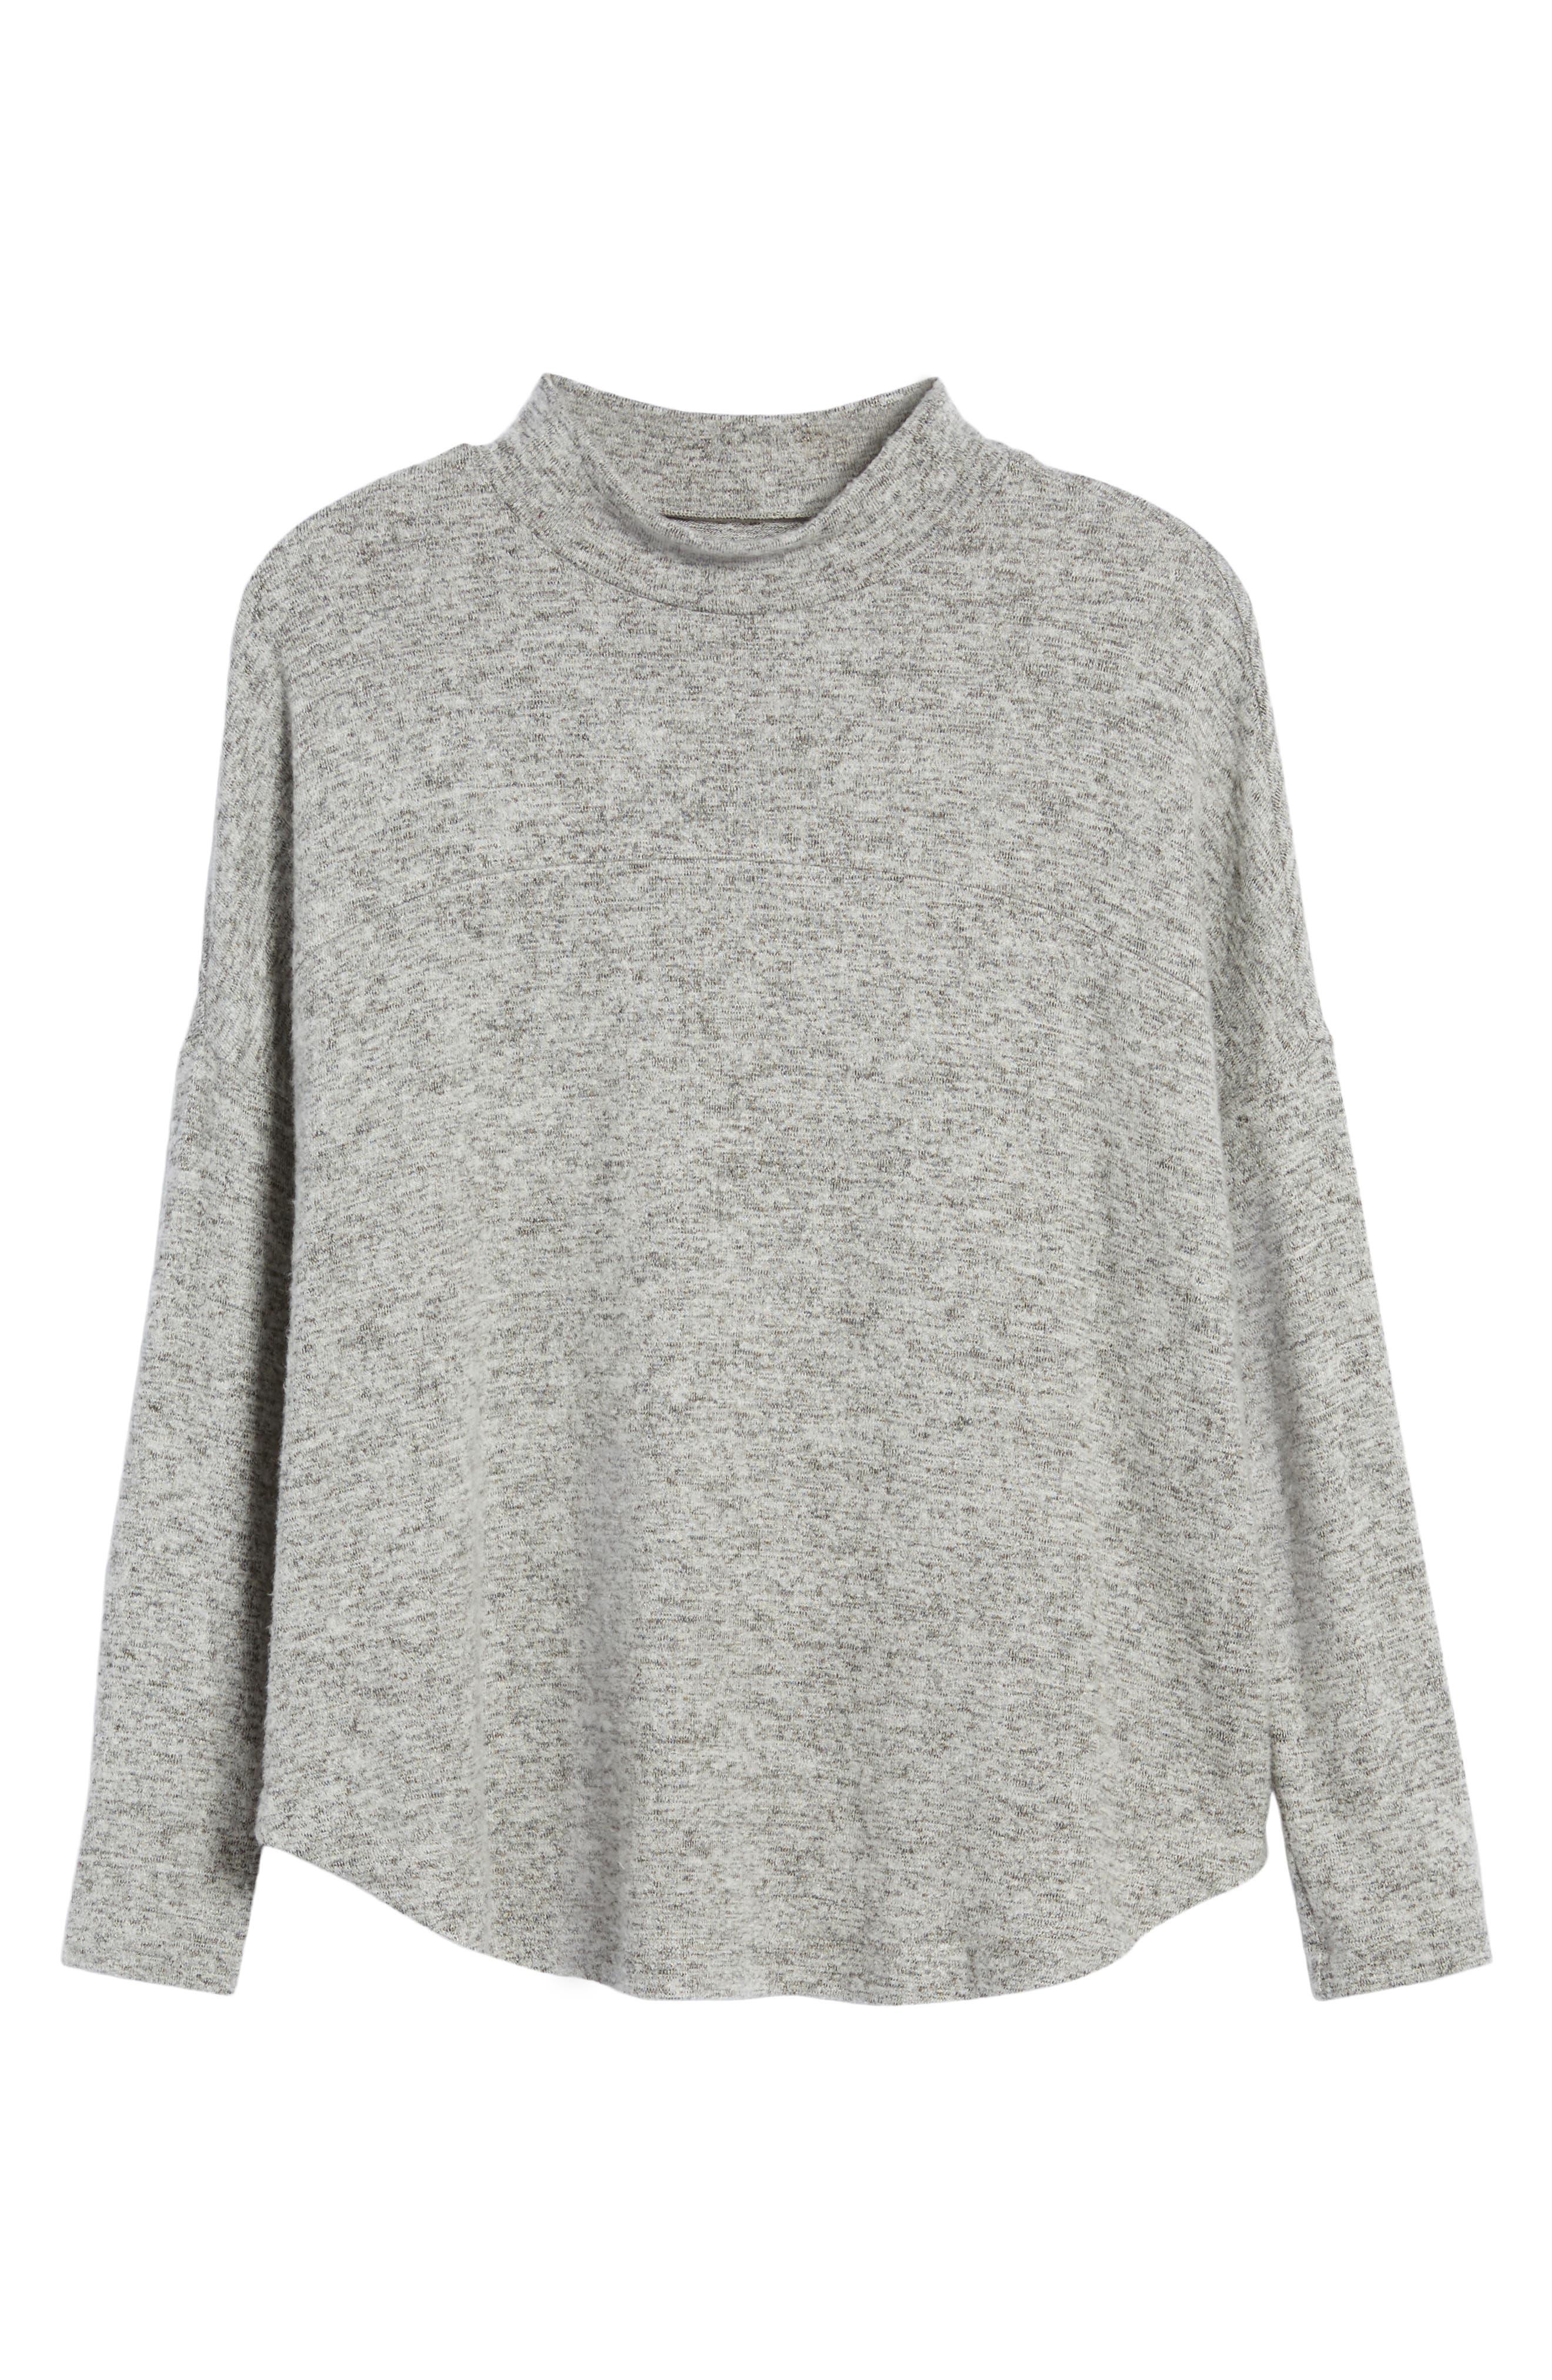 Mock Neck Sweater,                             Alternate thumbnail 6, color,                             020